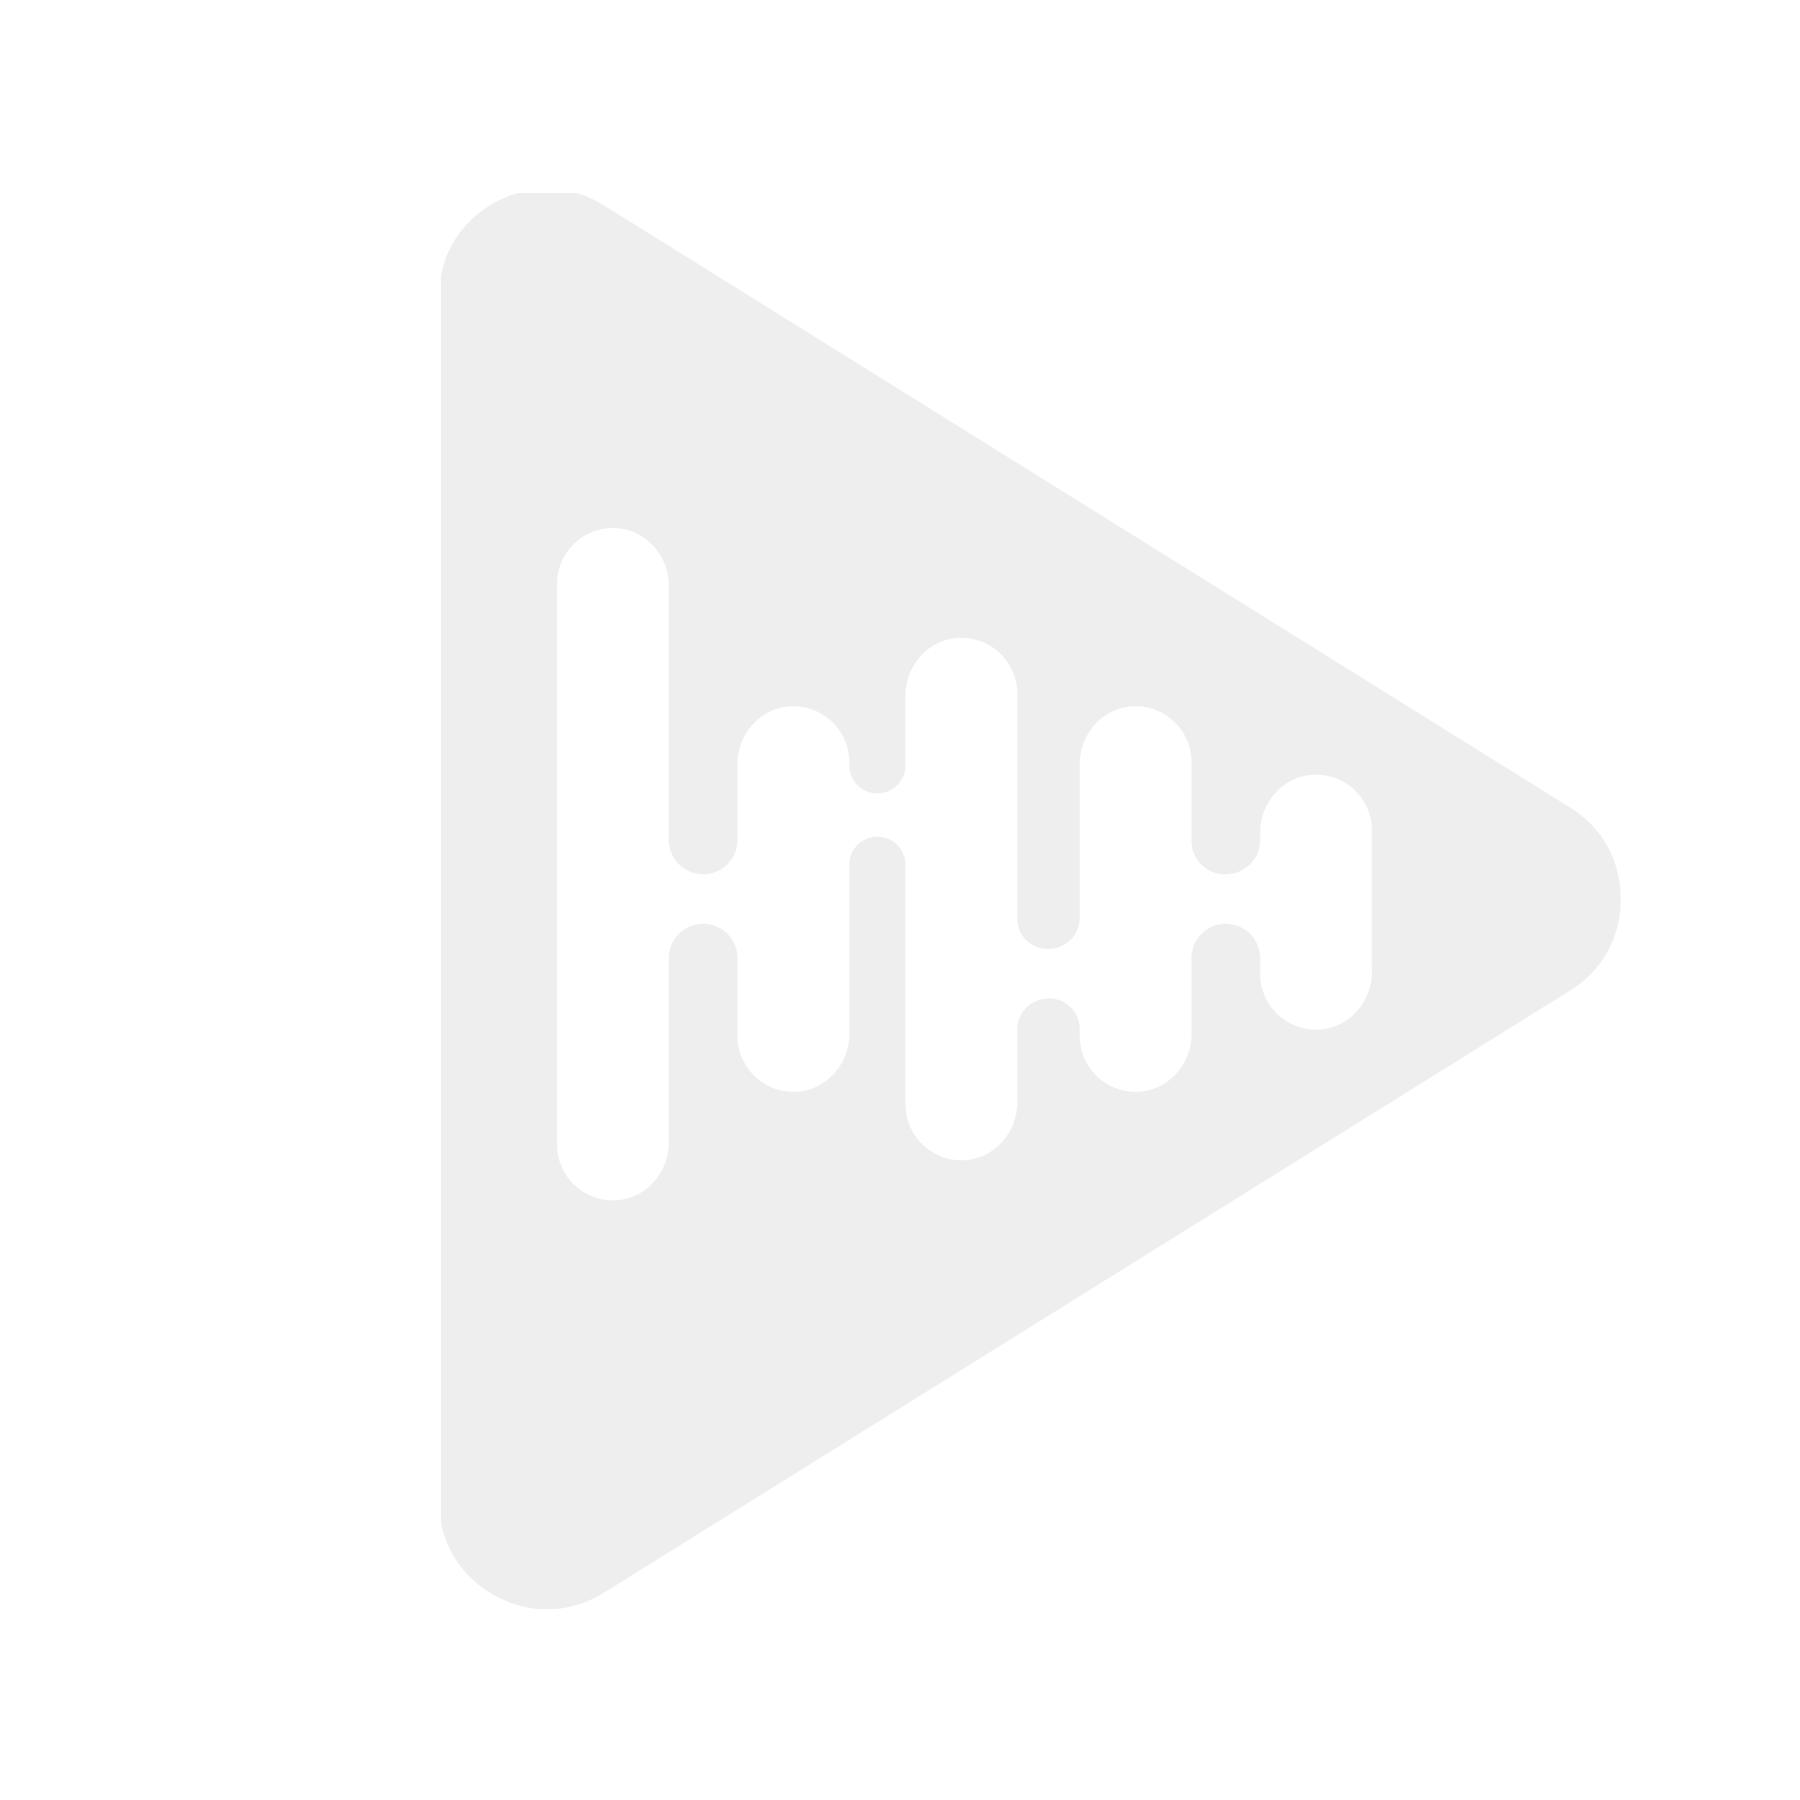 Klipsch 1011633